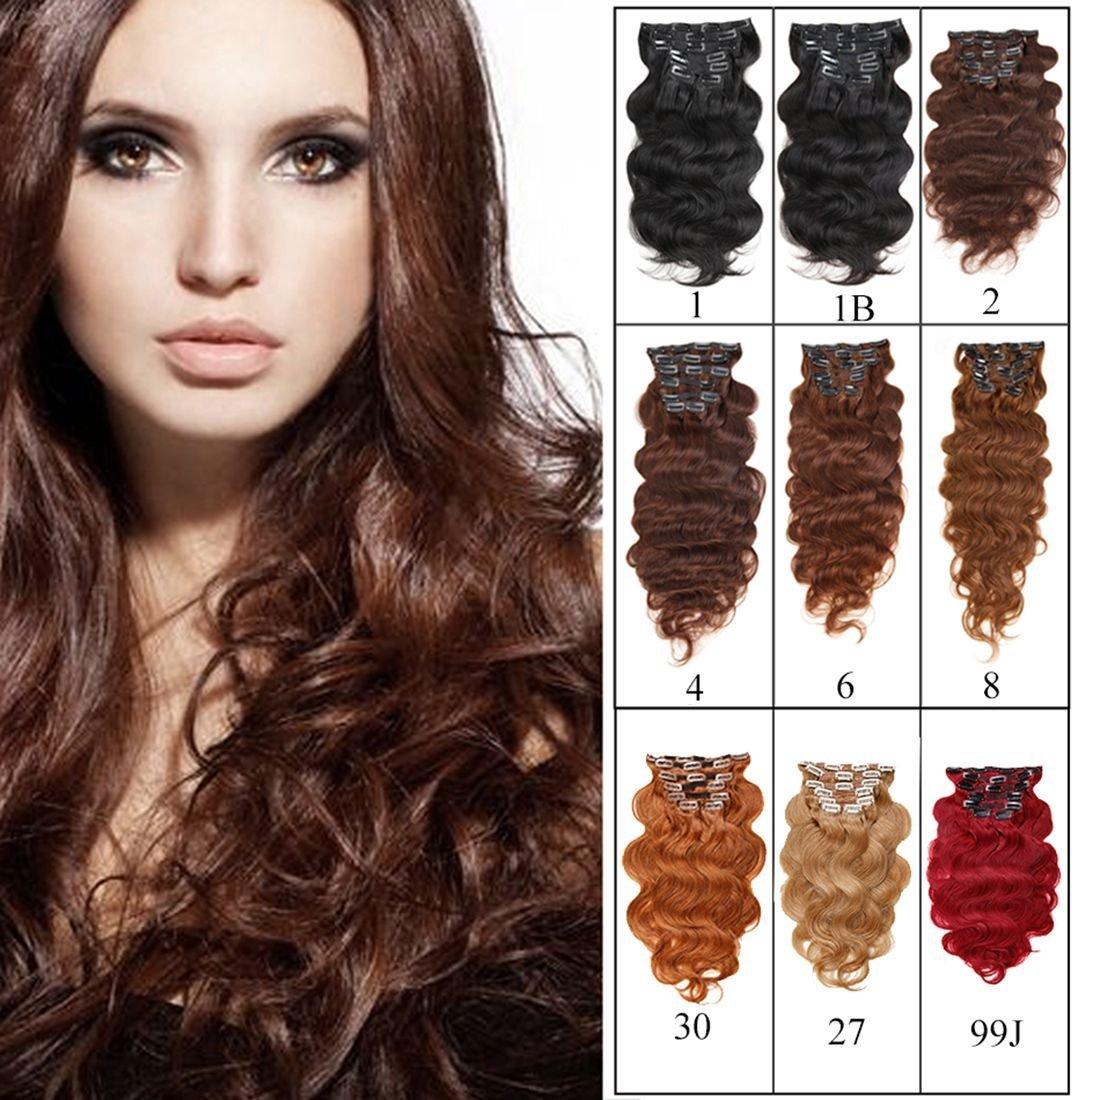 "Full Head Clip in Hair Extensions Body Wave Human Hair Brazilian Virgin Hair Double Weft Black Brown Blonde Burgundy Copper Red 7Peices/set 70g-160g (200g 24"", Dark/Medium Brown)"